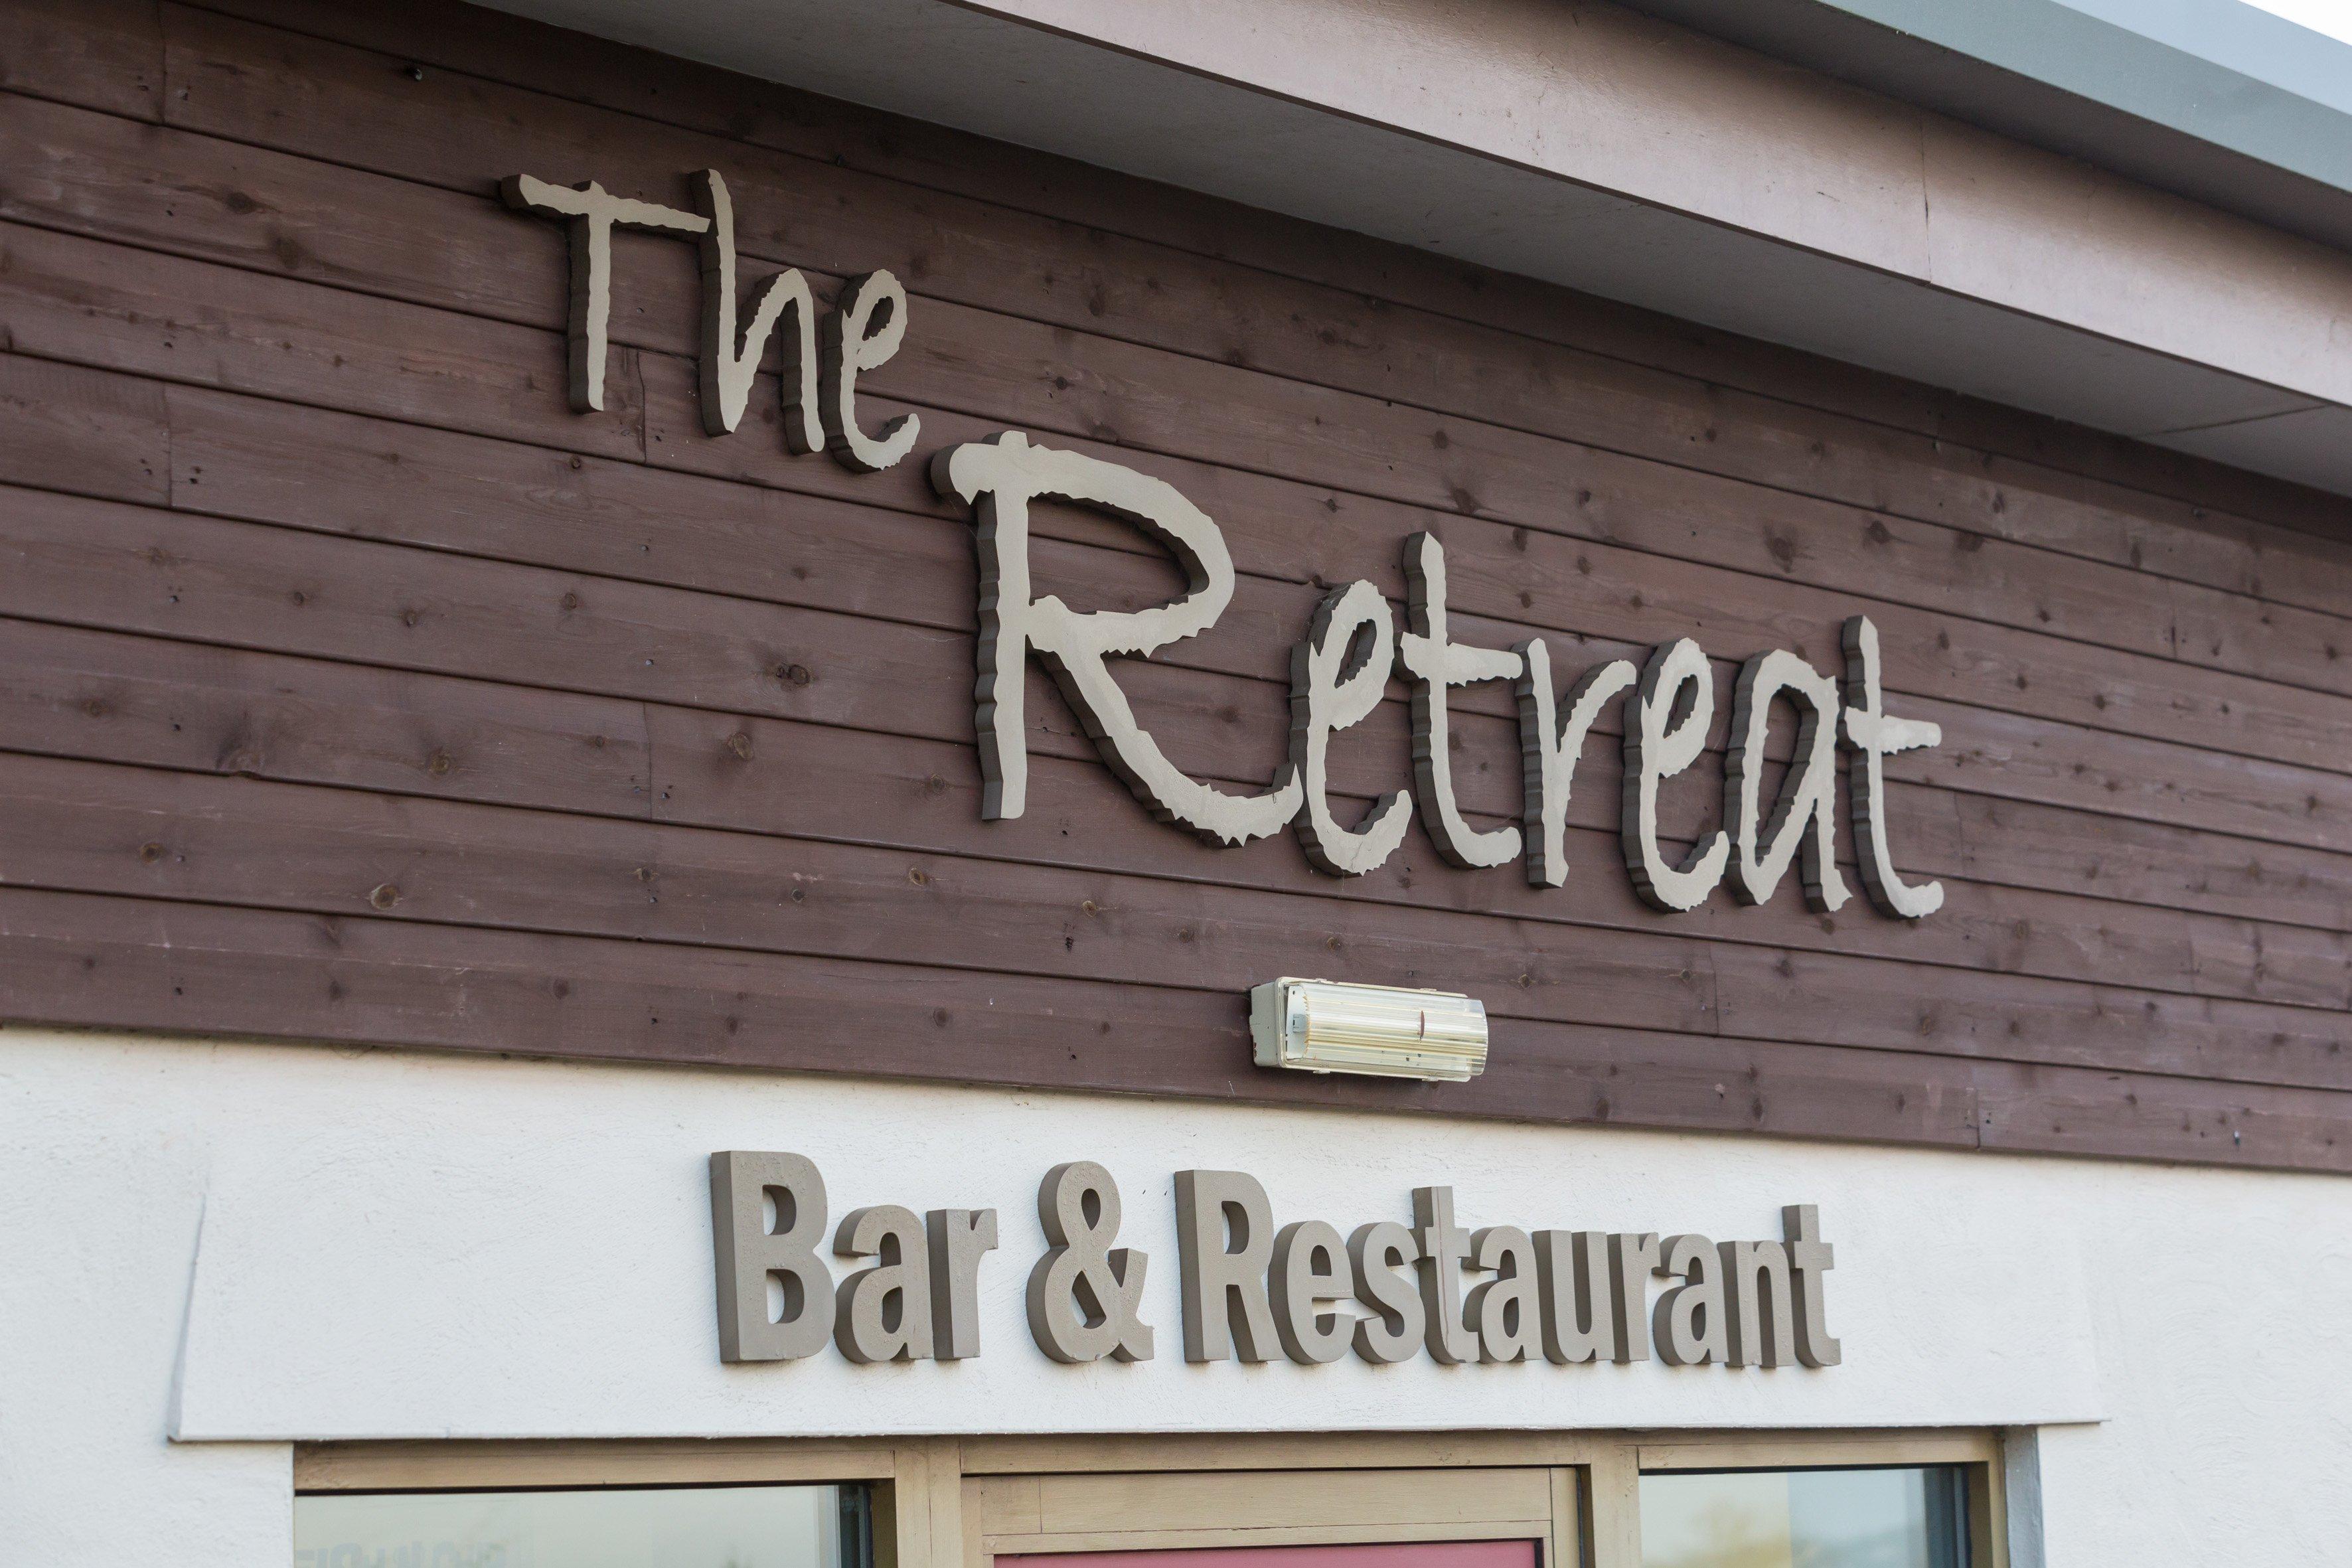 The Retreat name board